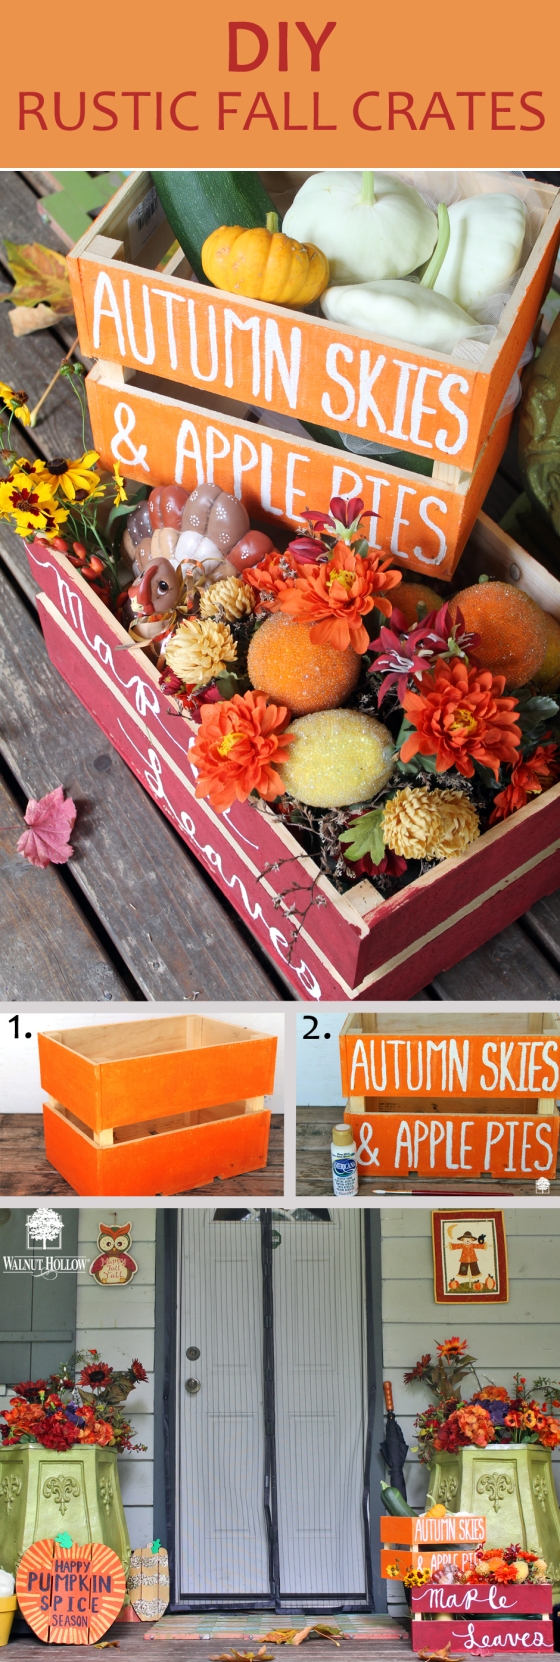 diy fall crates porch decor pin